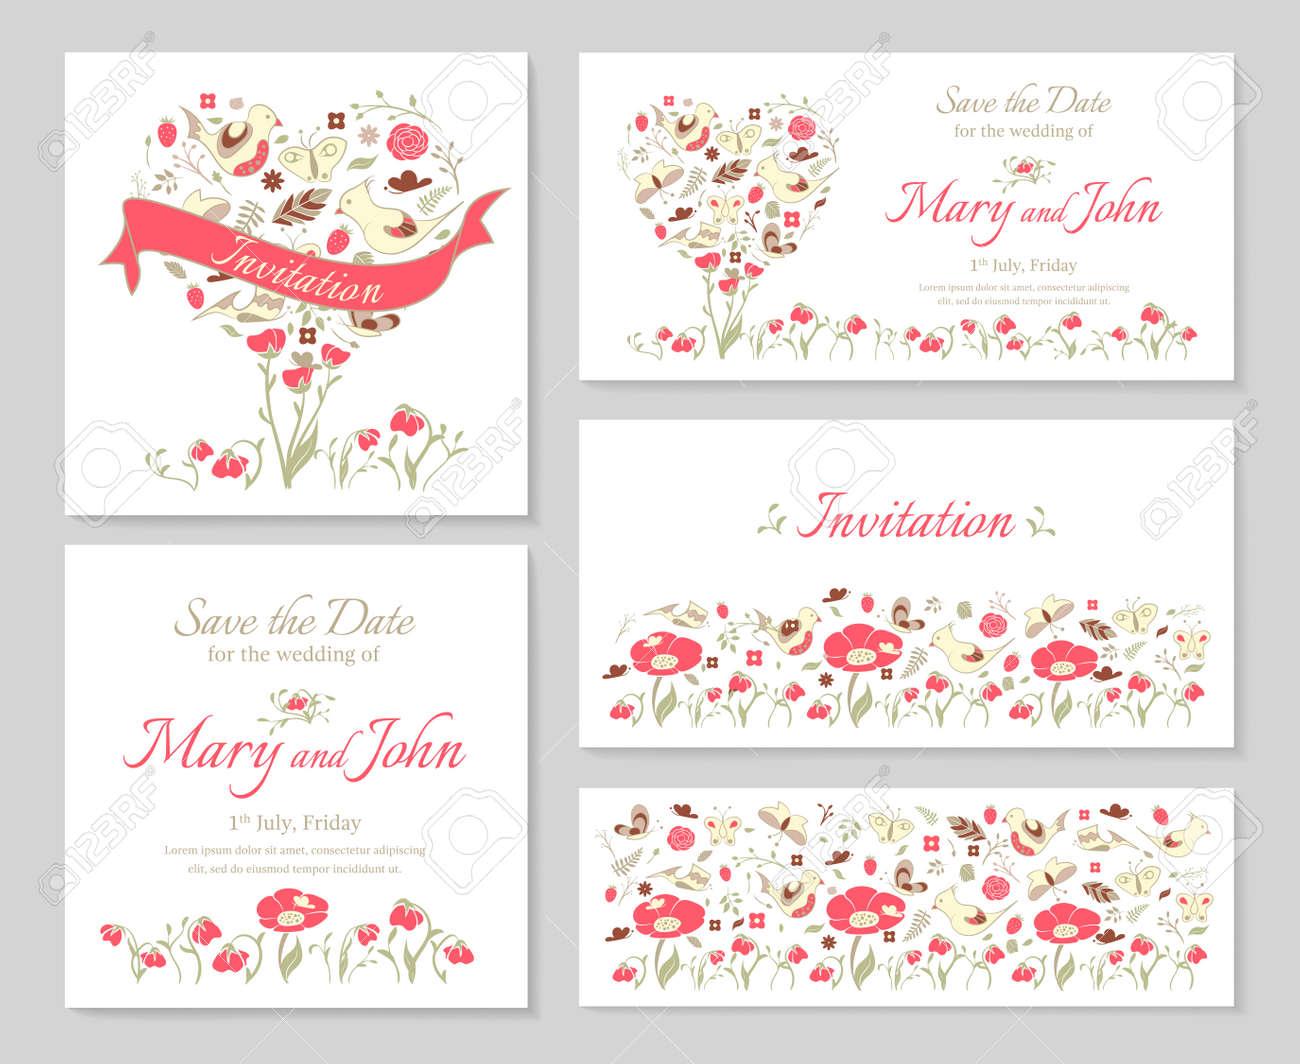 Plantilla Invitacion Boda. Finest Clip Art Rosas Plantilla Invitacin ...